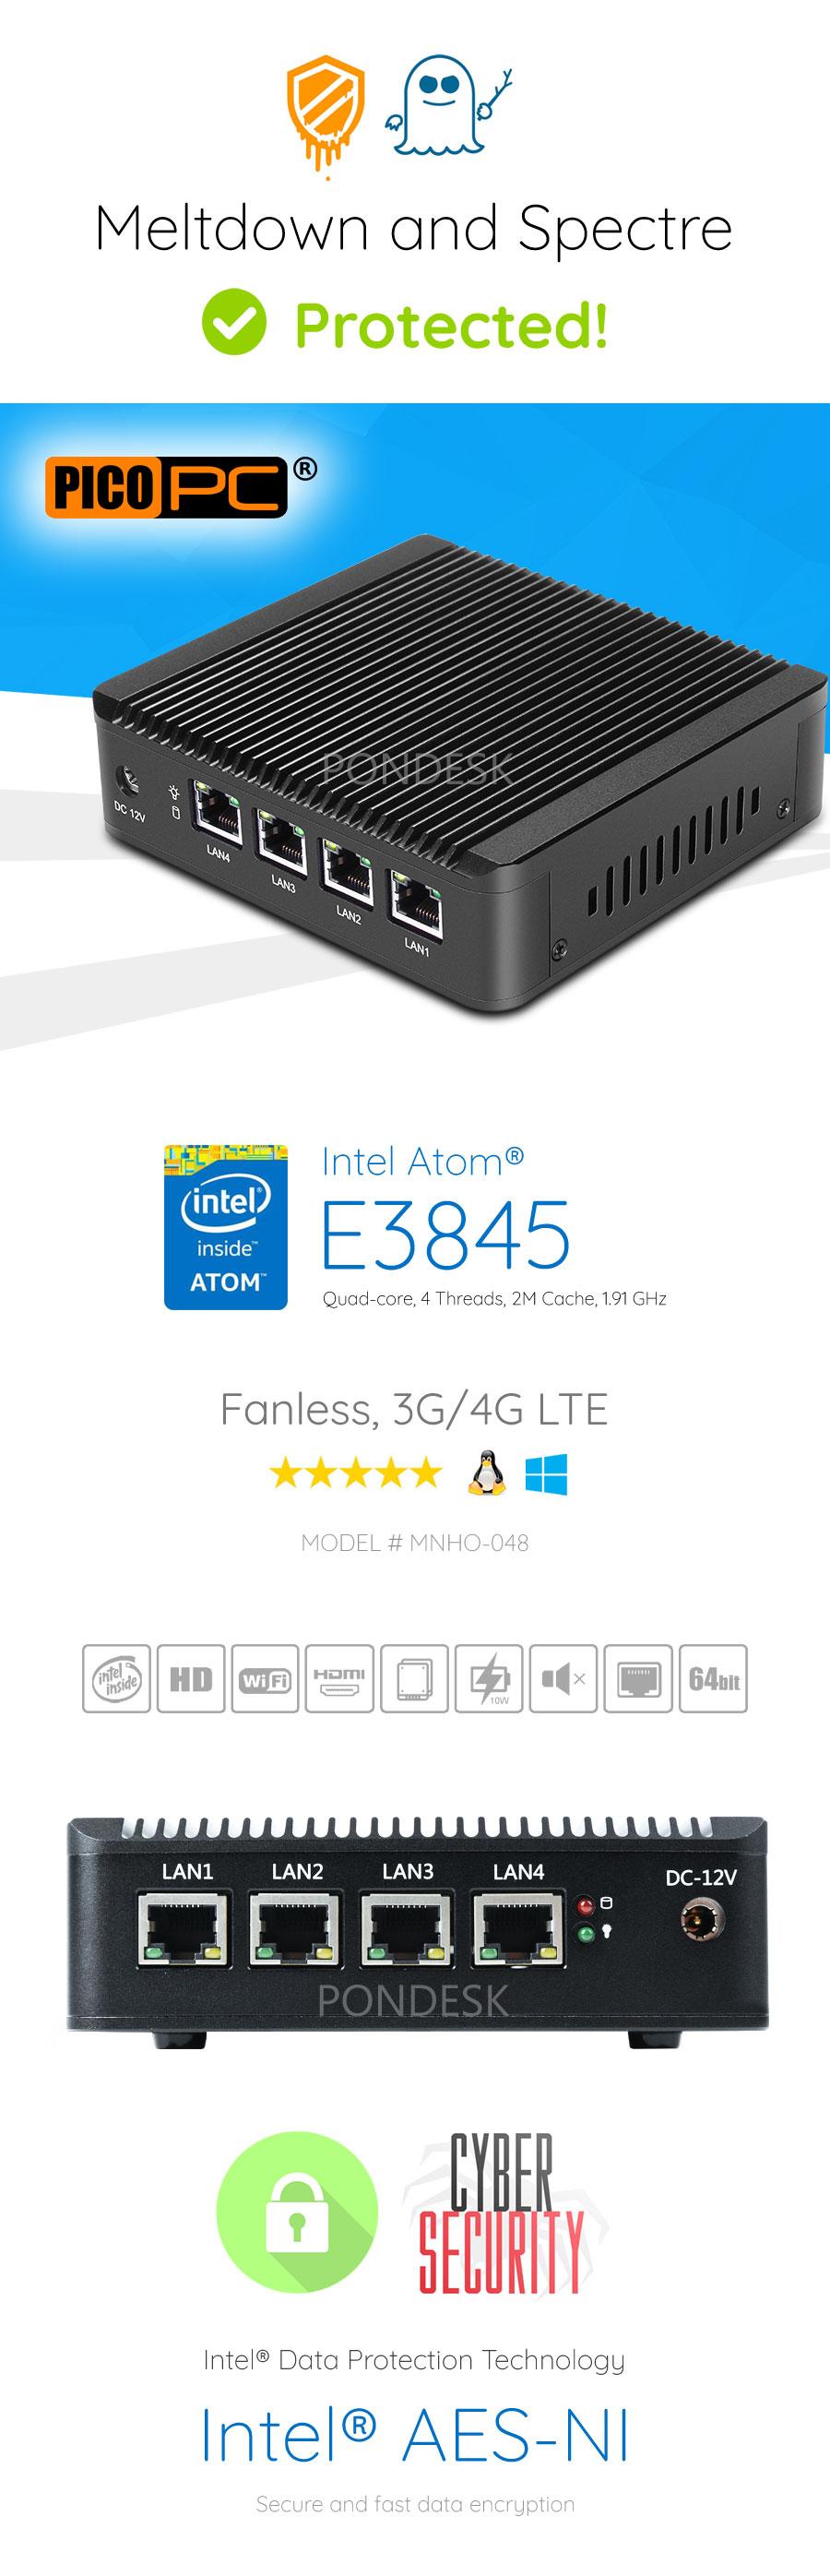 Intel Atom® E3845 4 LAN AES-NI 3G/4G Fanless Firewall Router - MNHO-048 | Image